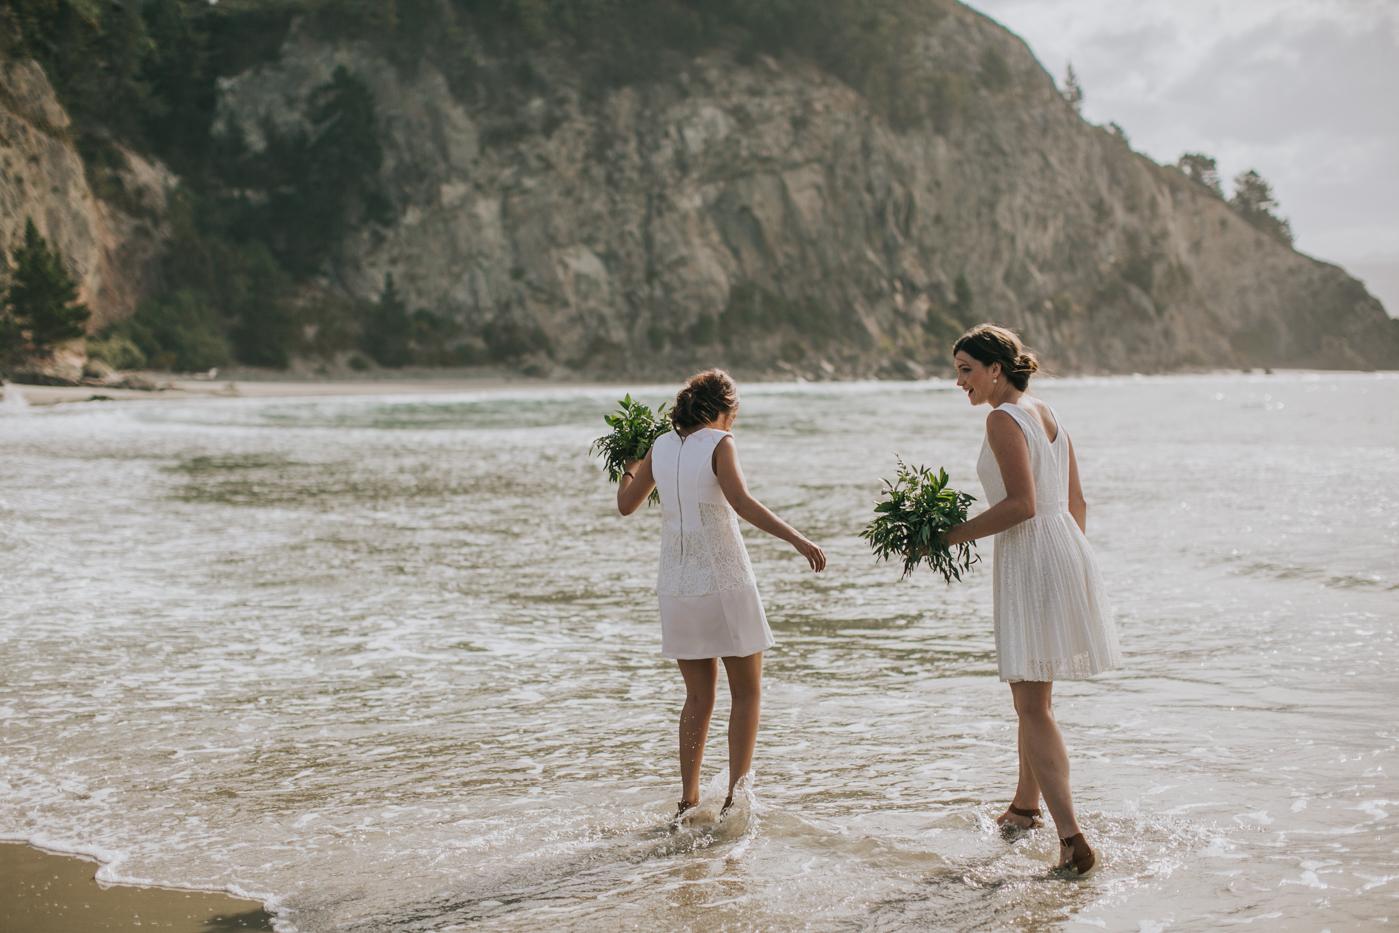 Ariana & Tim - Dunedin, New Zealand Wedding - Destination Wedding - Samantha Heather Photography-136.jpg